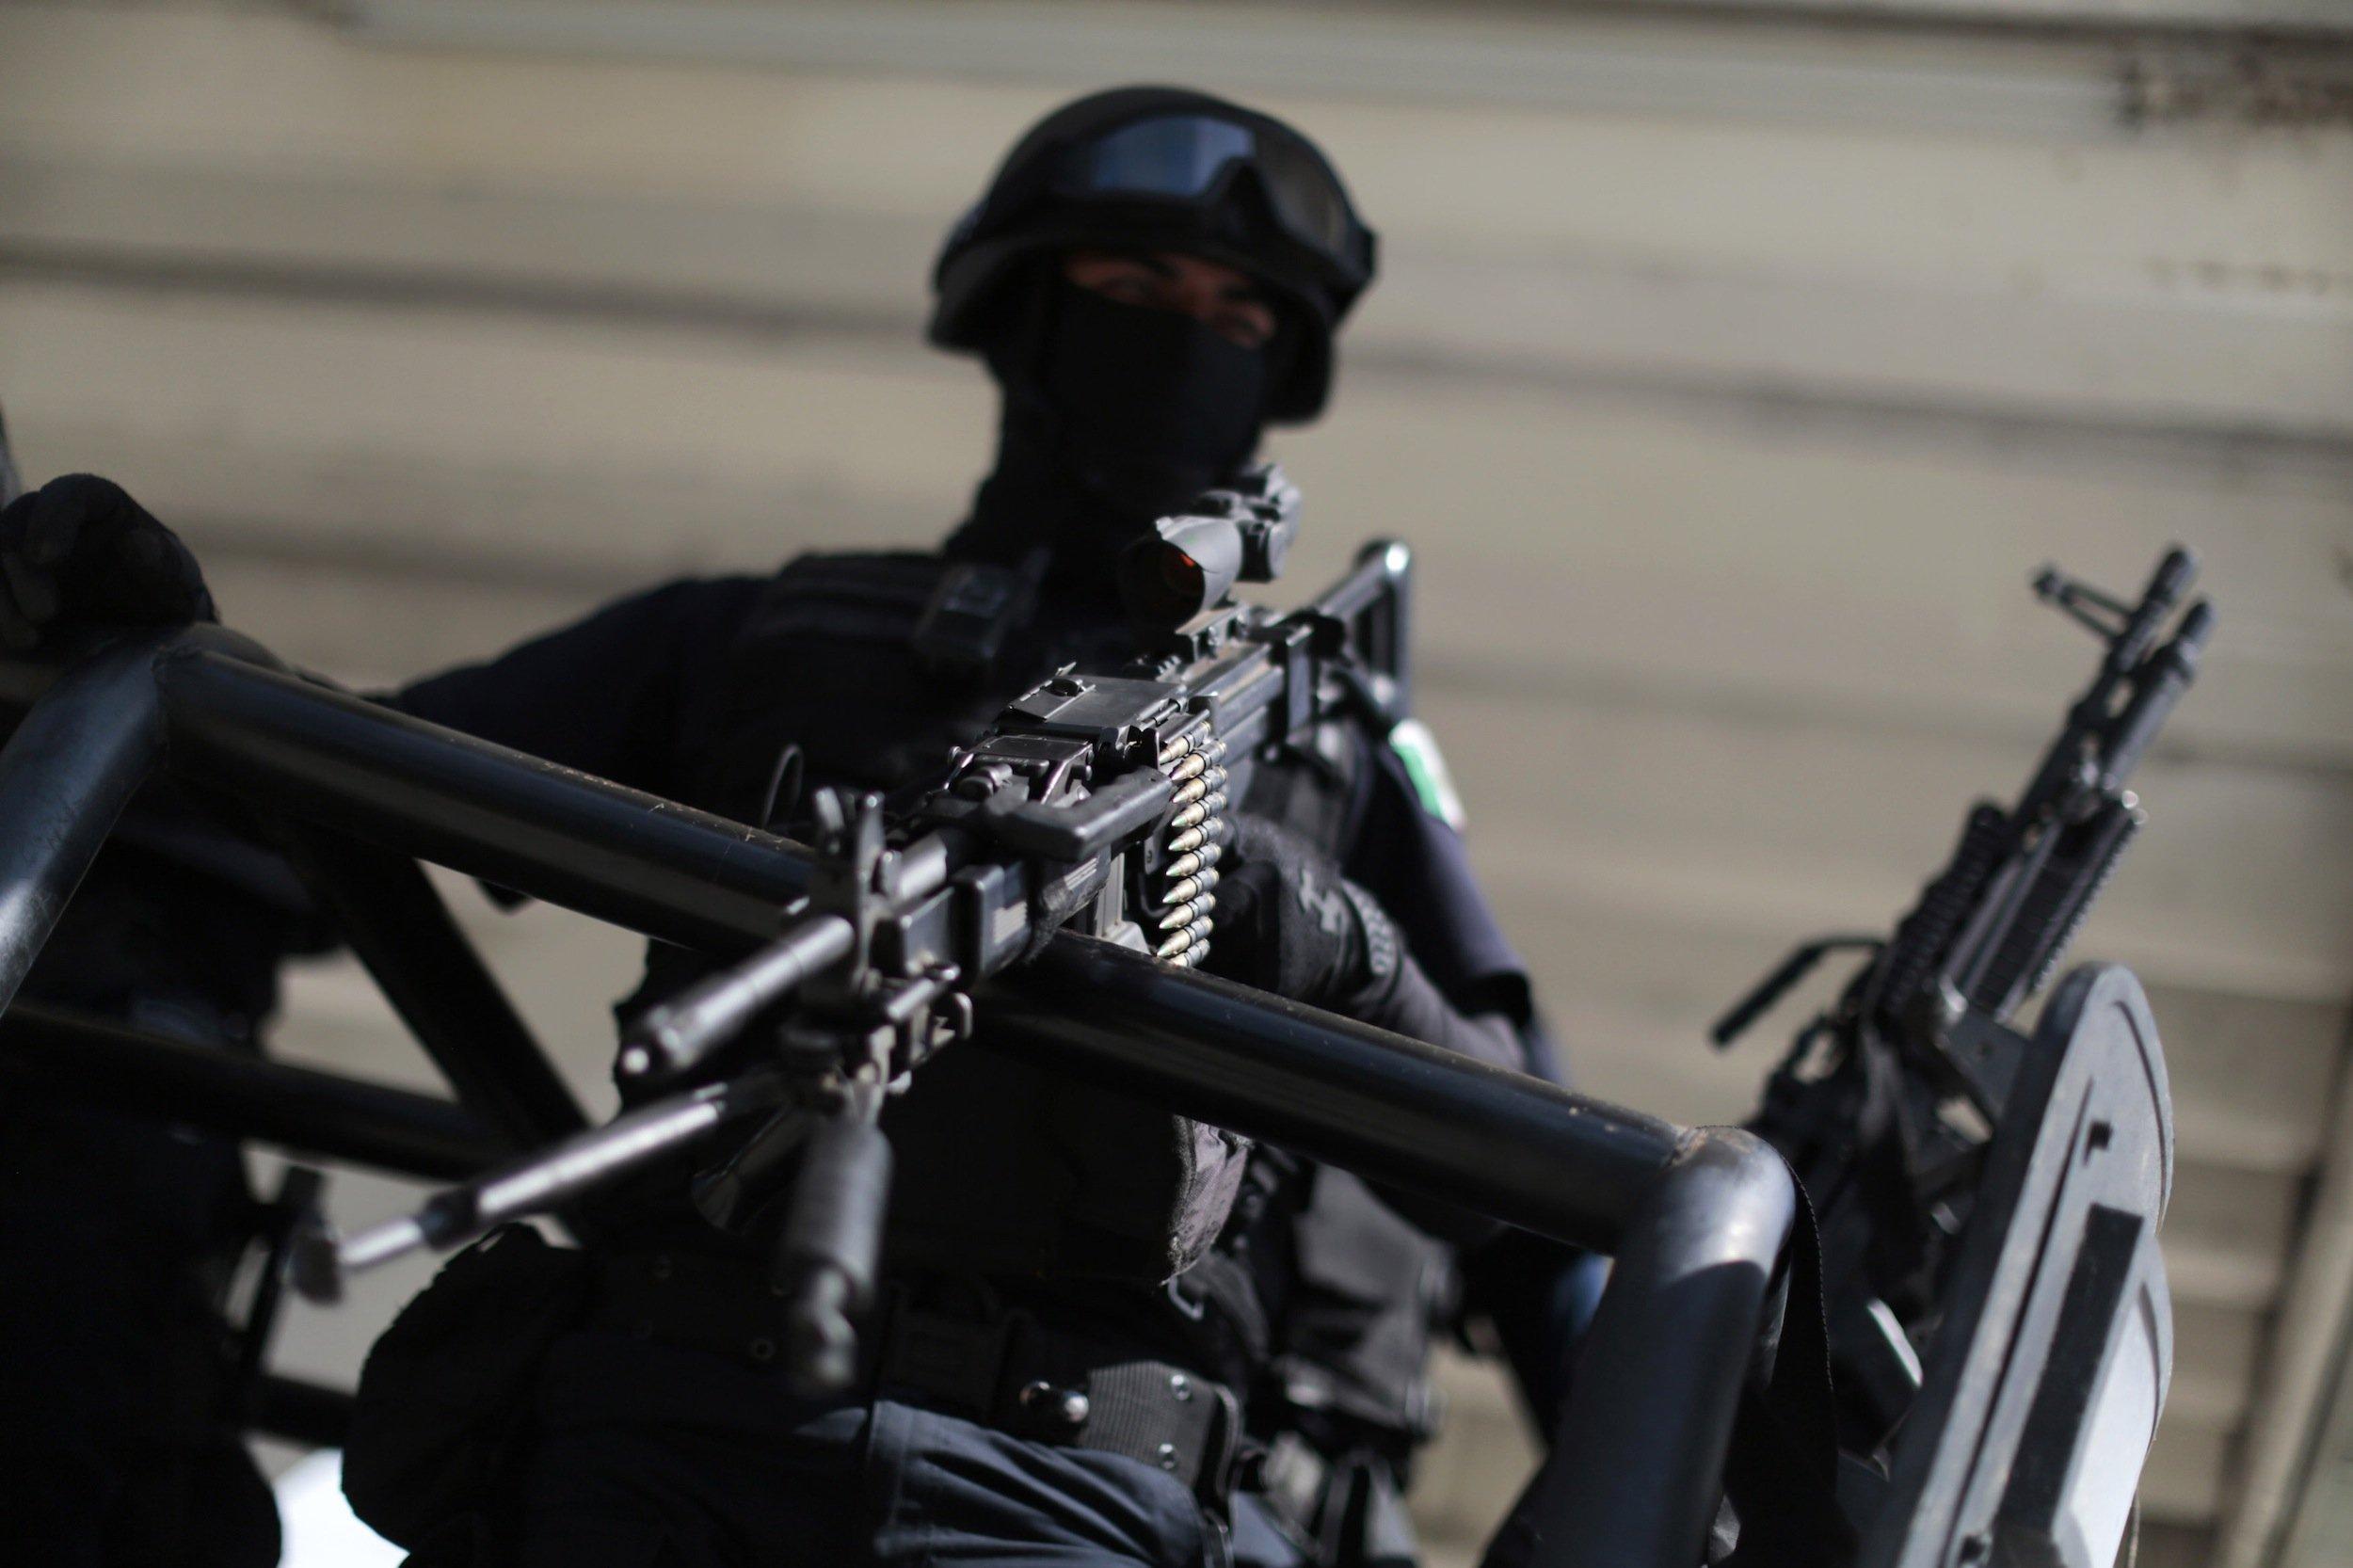 Leader of Tijuana Drug Cartel Captured in Northern Mexico